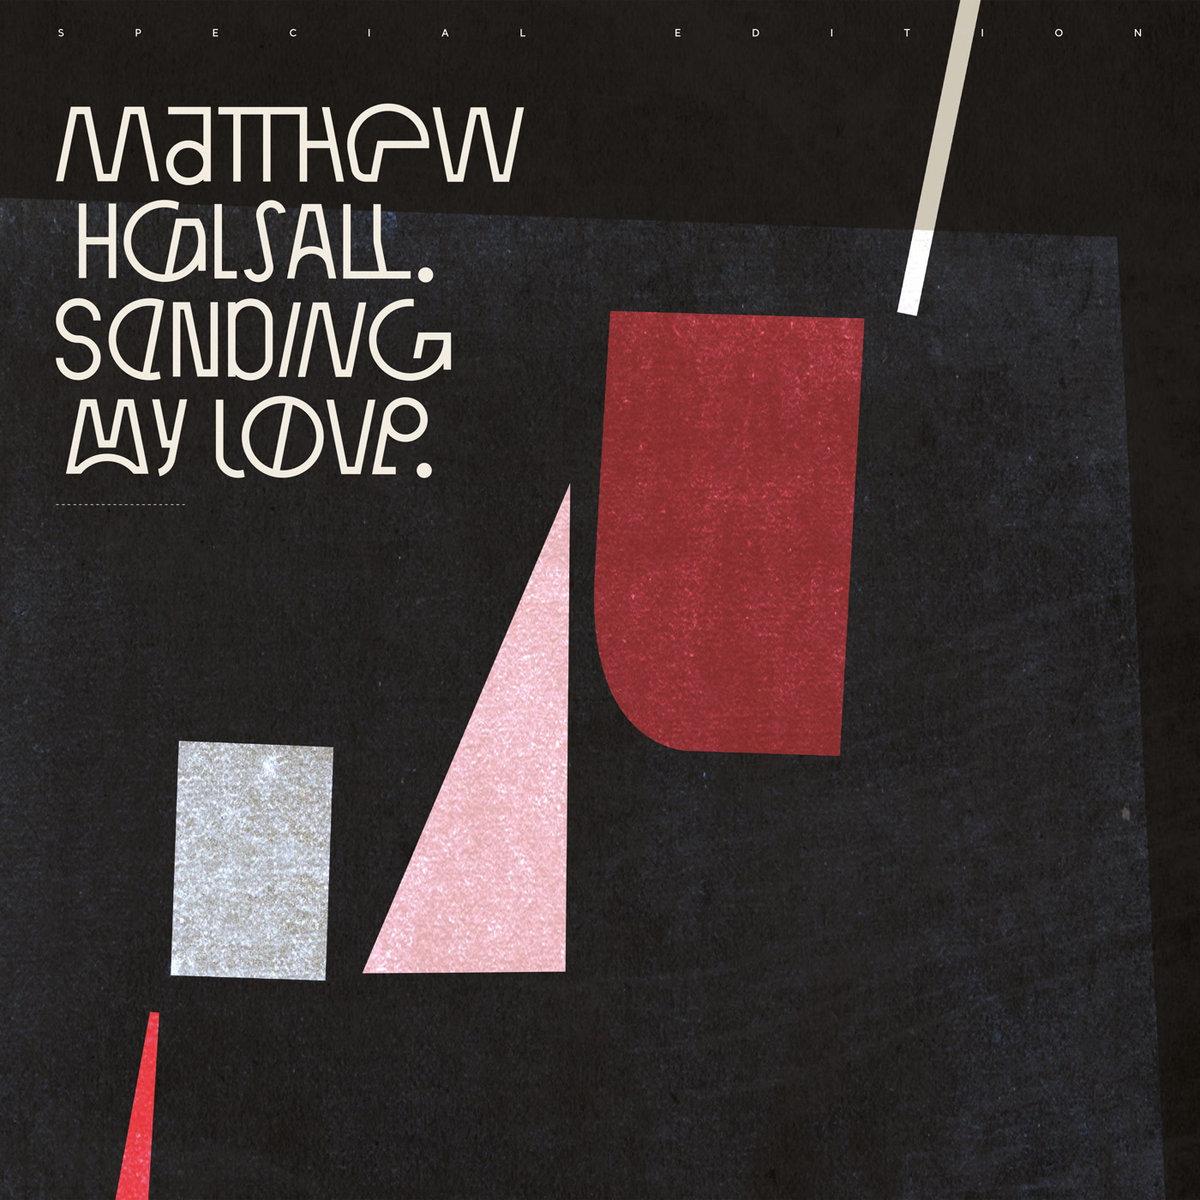 Sending My Love Special Edition Matthew Halsall